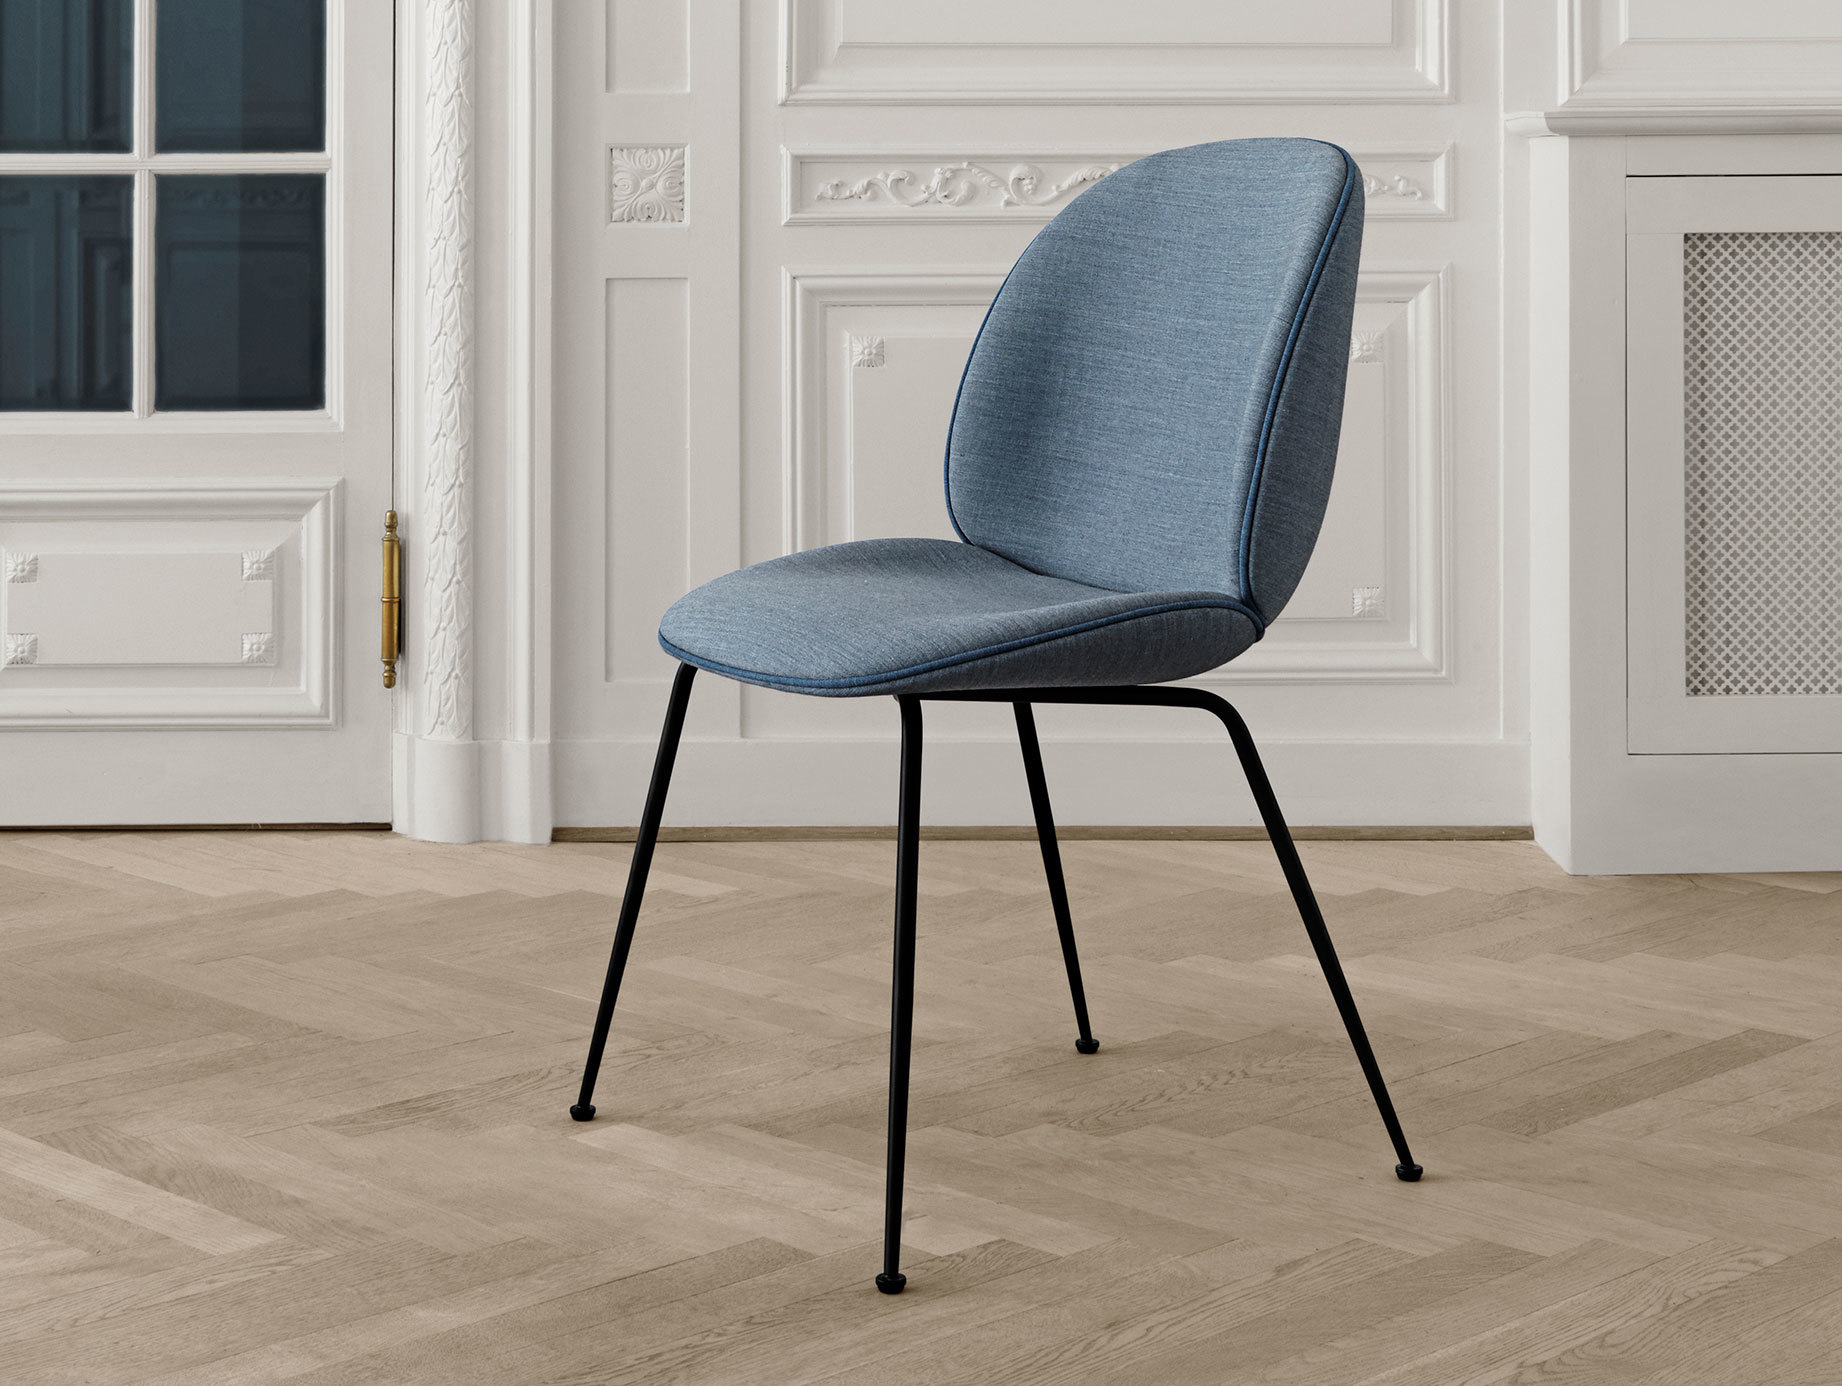 Gubi Beetle Chair Blue